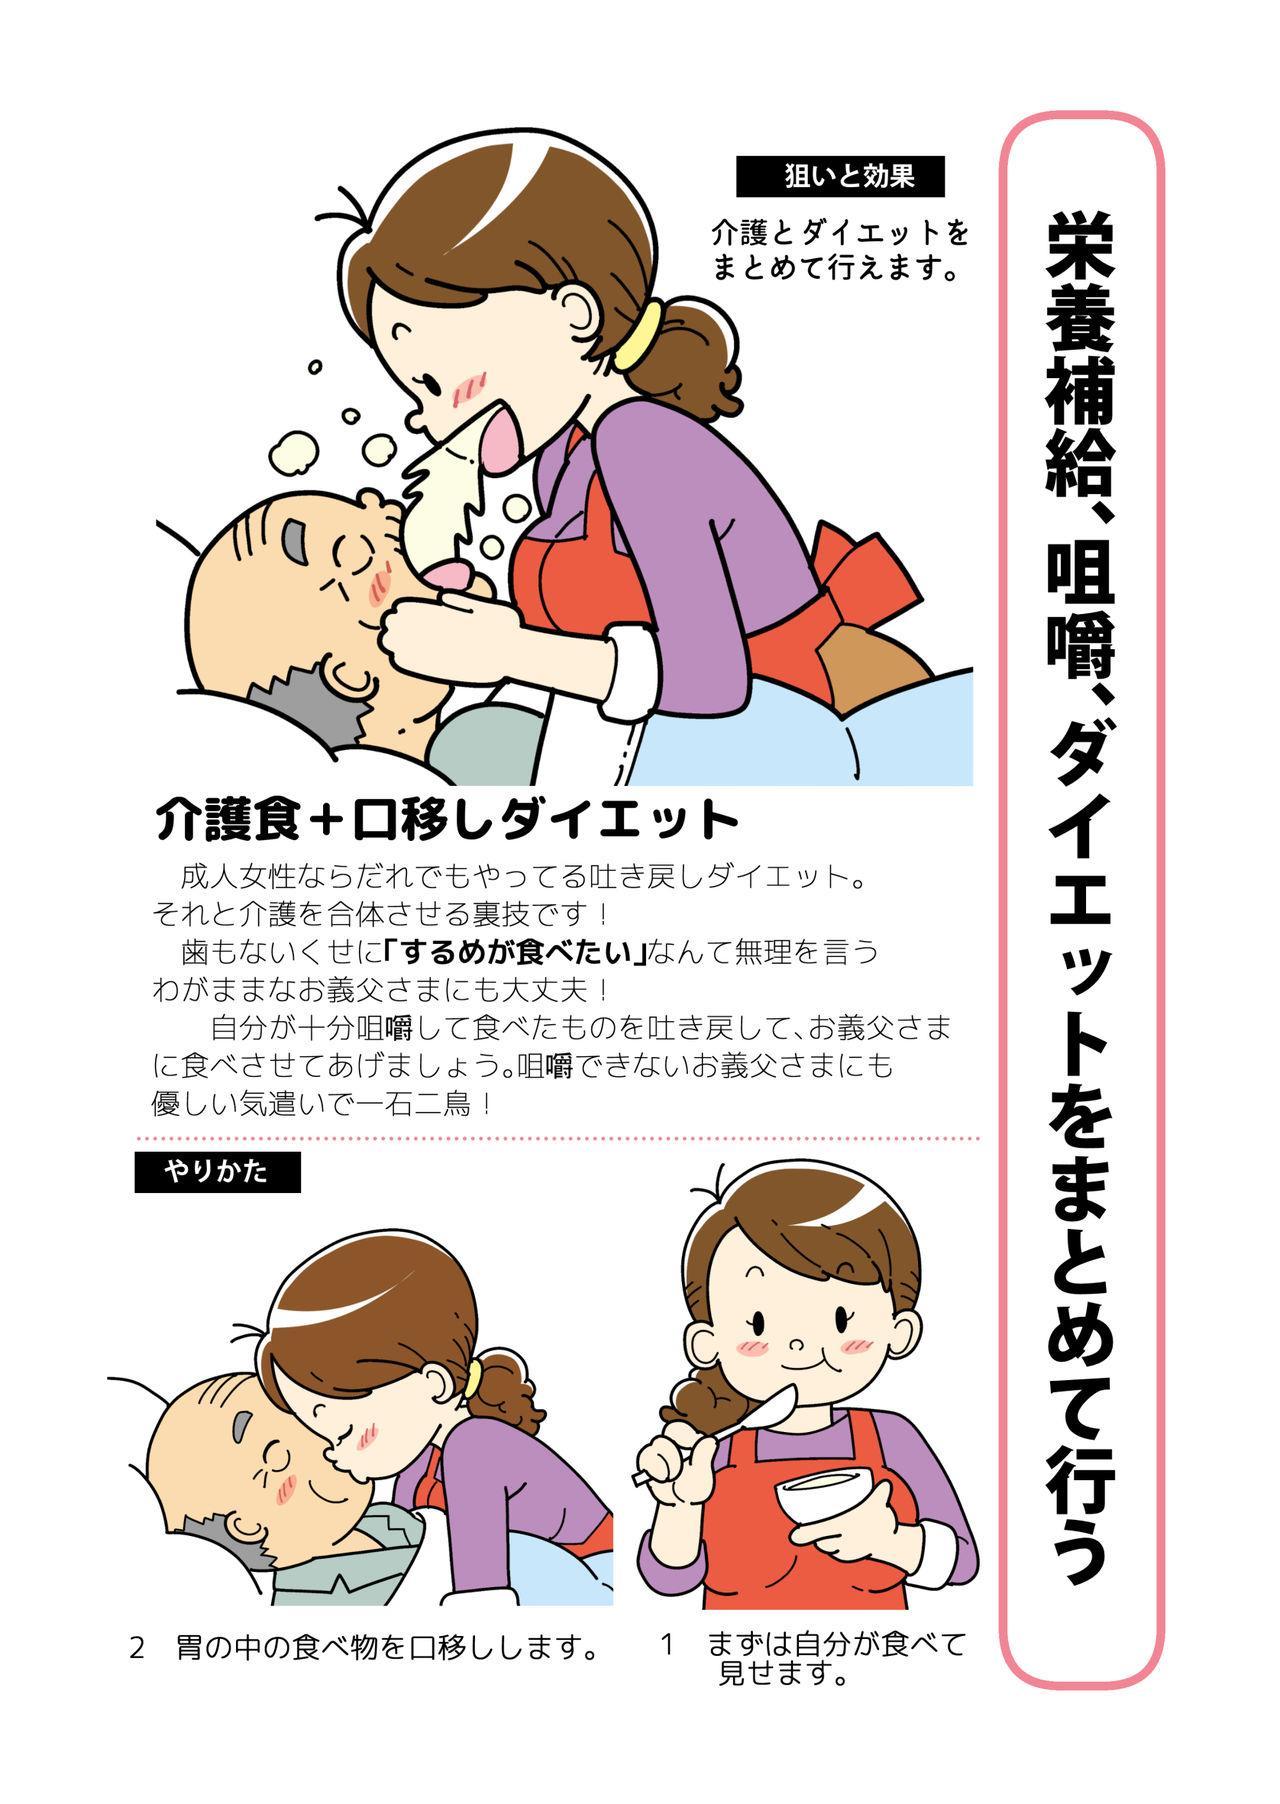 Isogasii Okaasan No Tamuno Sasa Rouzin Seikaigo | Guide for Elderly Sex Health Care to Busy Mom 29